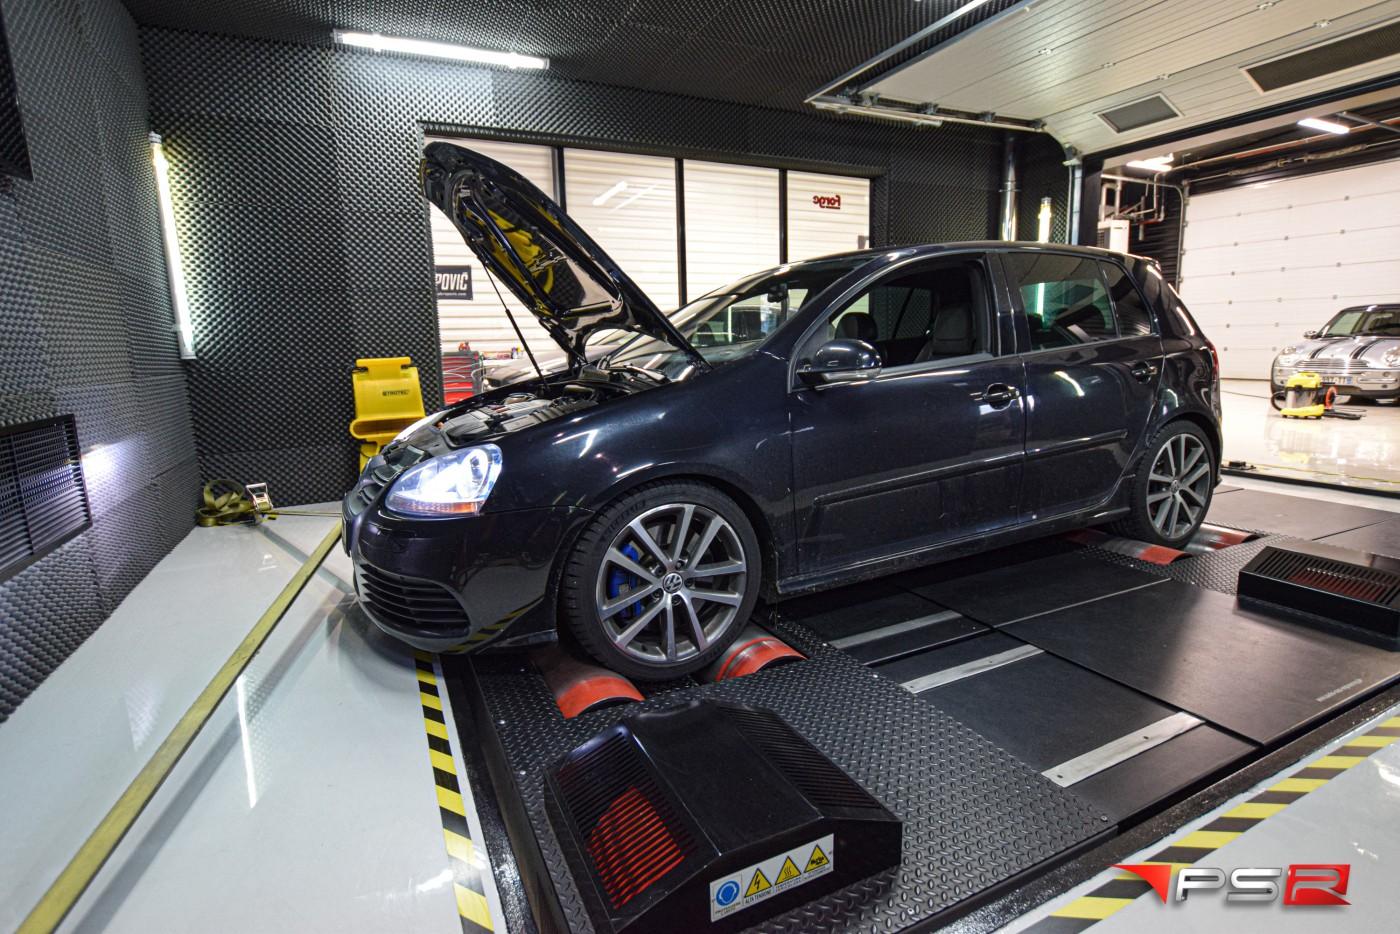 VW GOLF V R32 ETHANOL